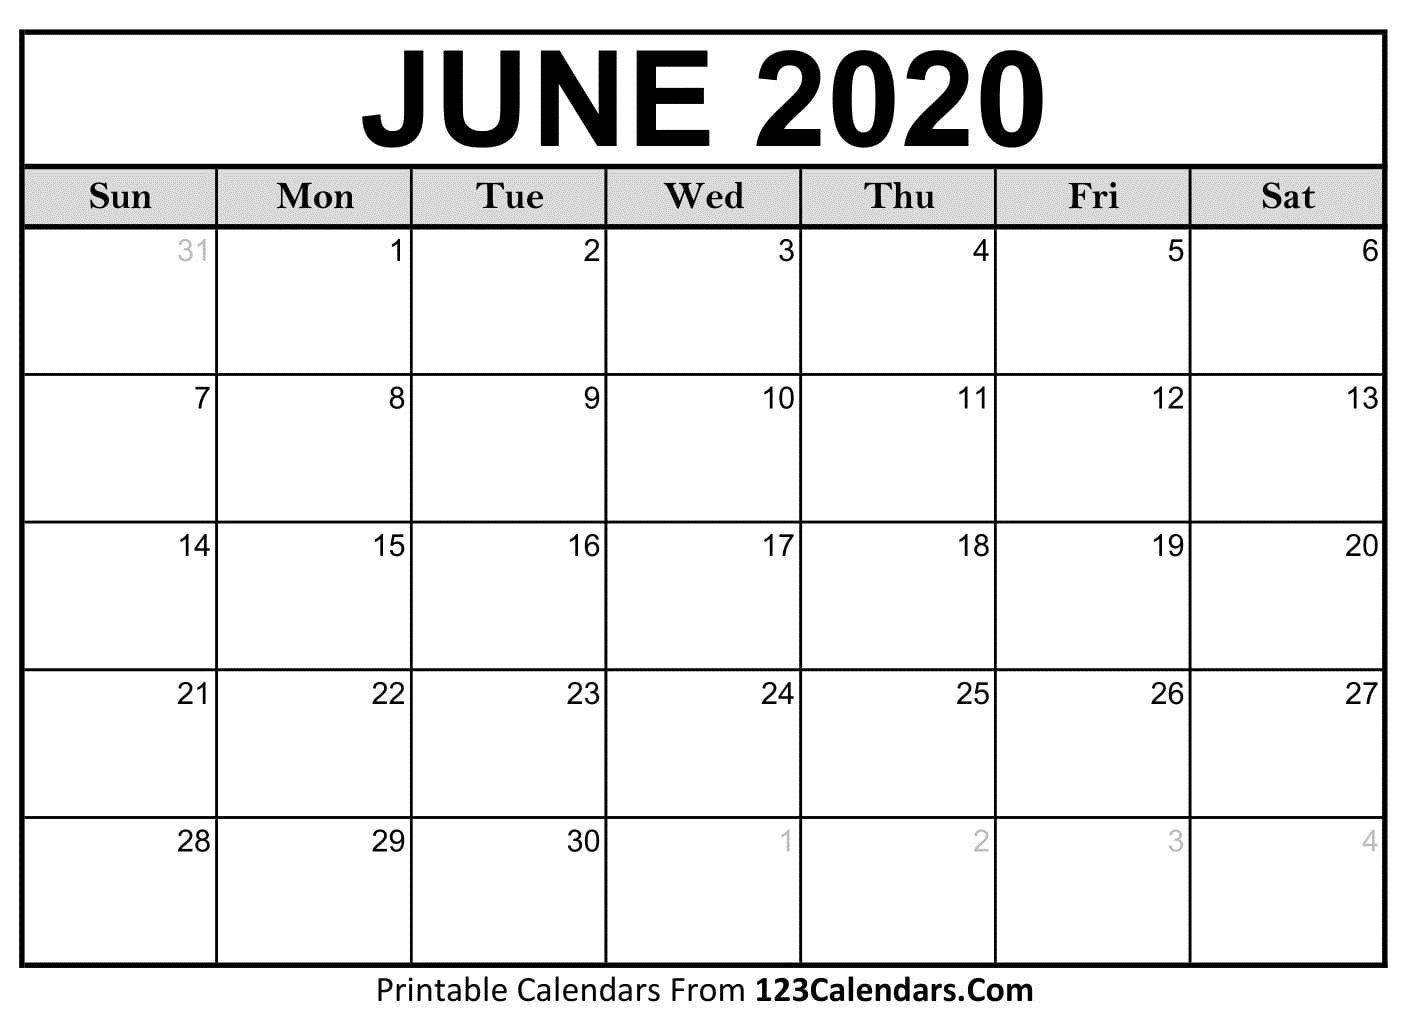 004 Amazing June 2020 Monthly Calendar Template Image Full